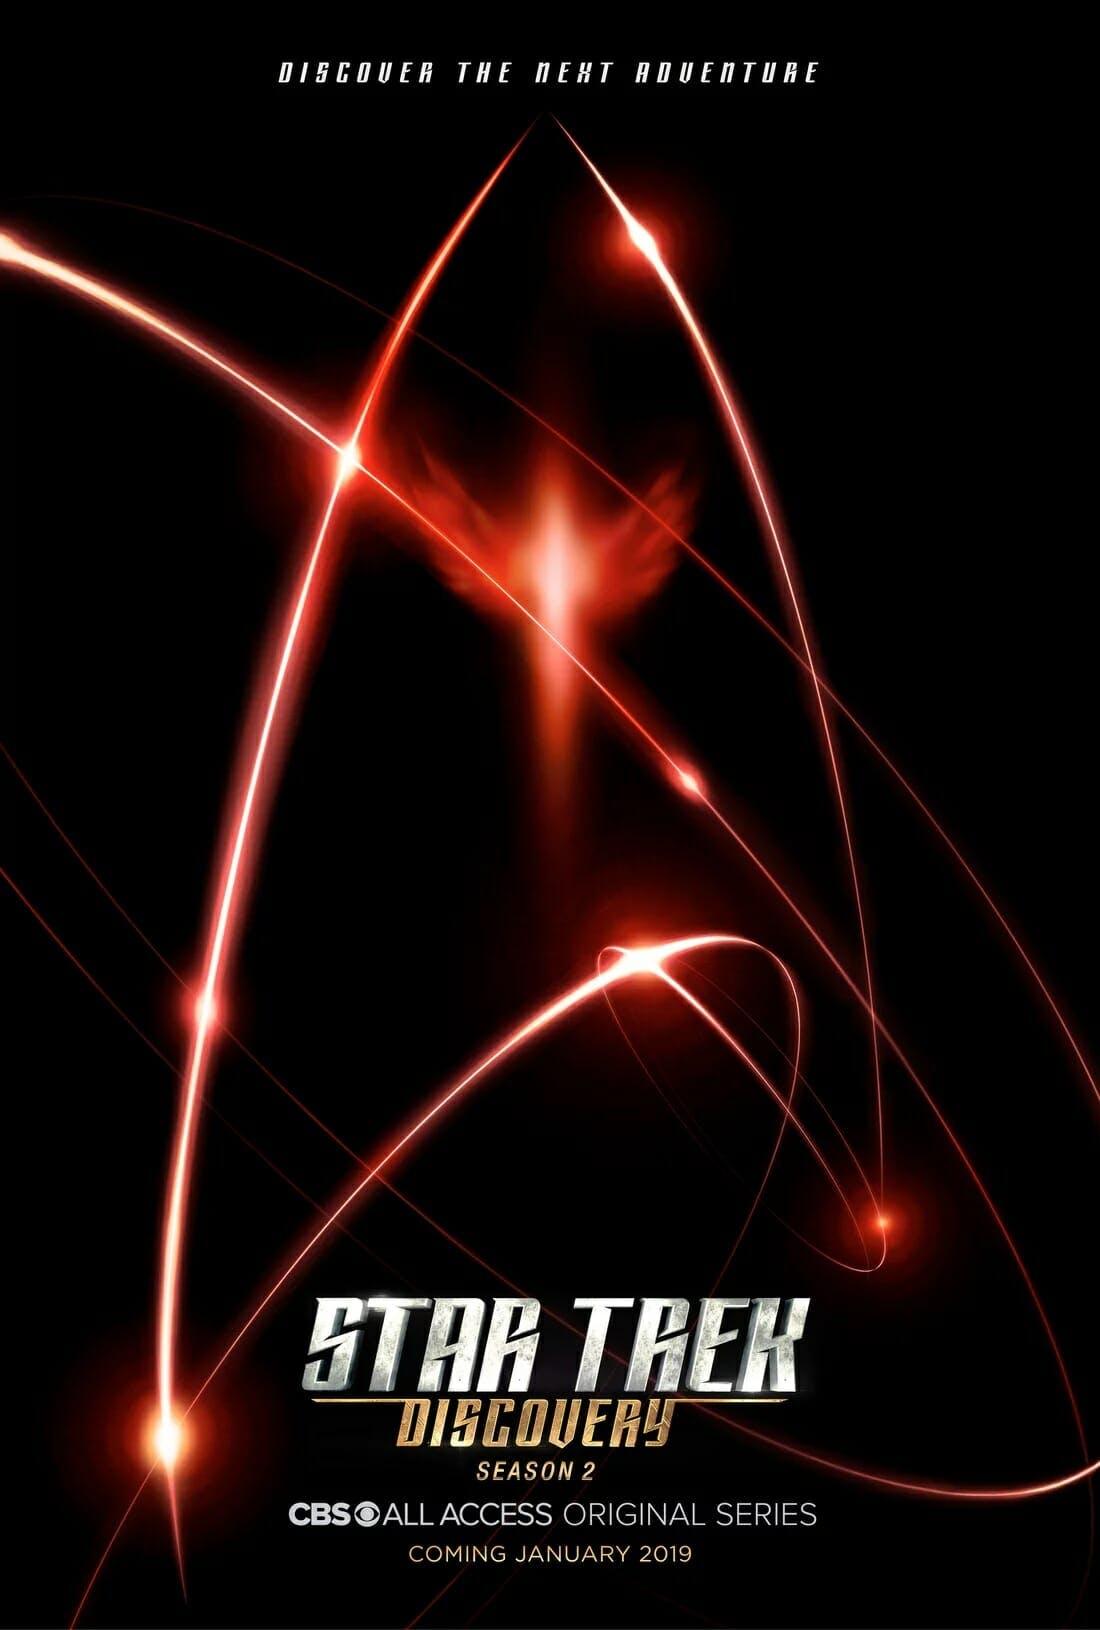 star trek discovery season 2 release date poster